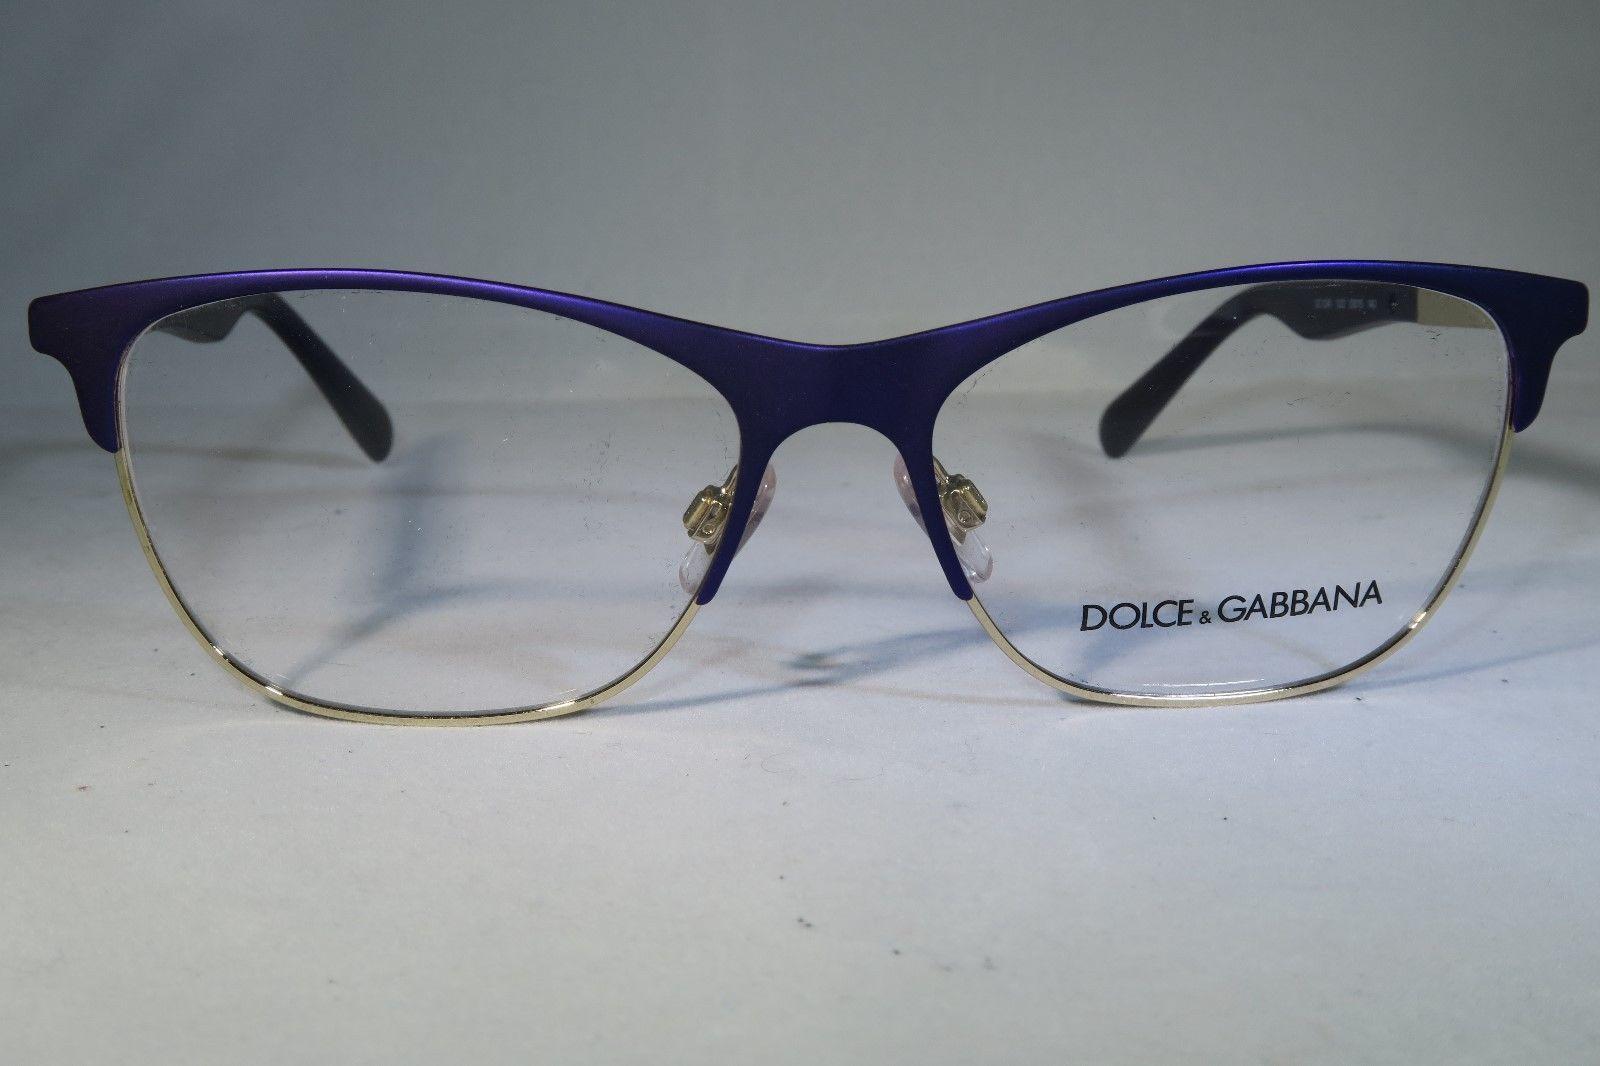 Dolce Gabbana DG 1246 1222 Purple Gold New Eyeglasses 53mm 15mm ...